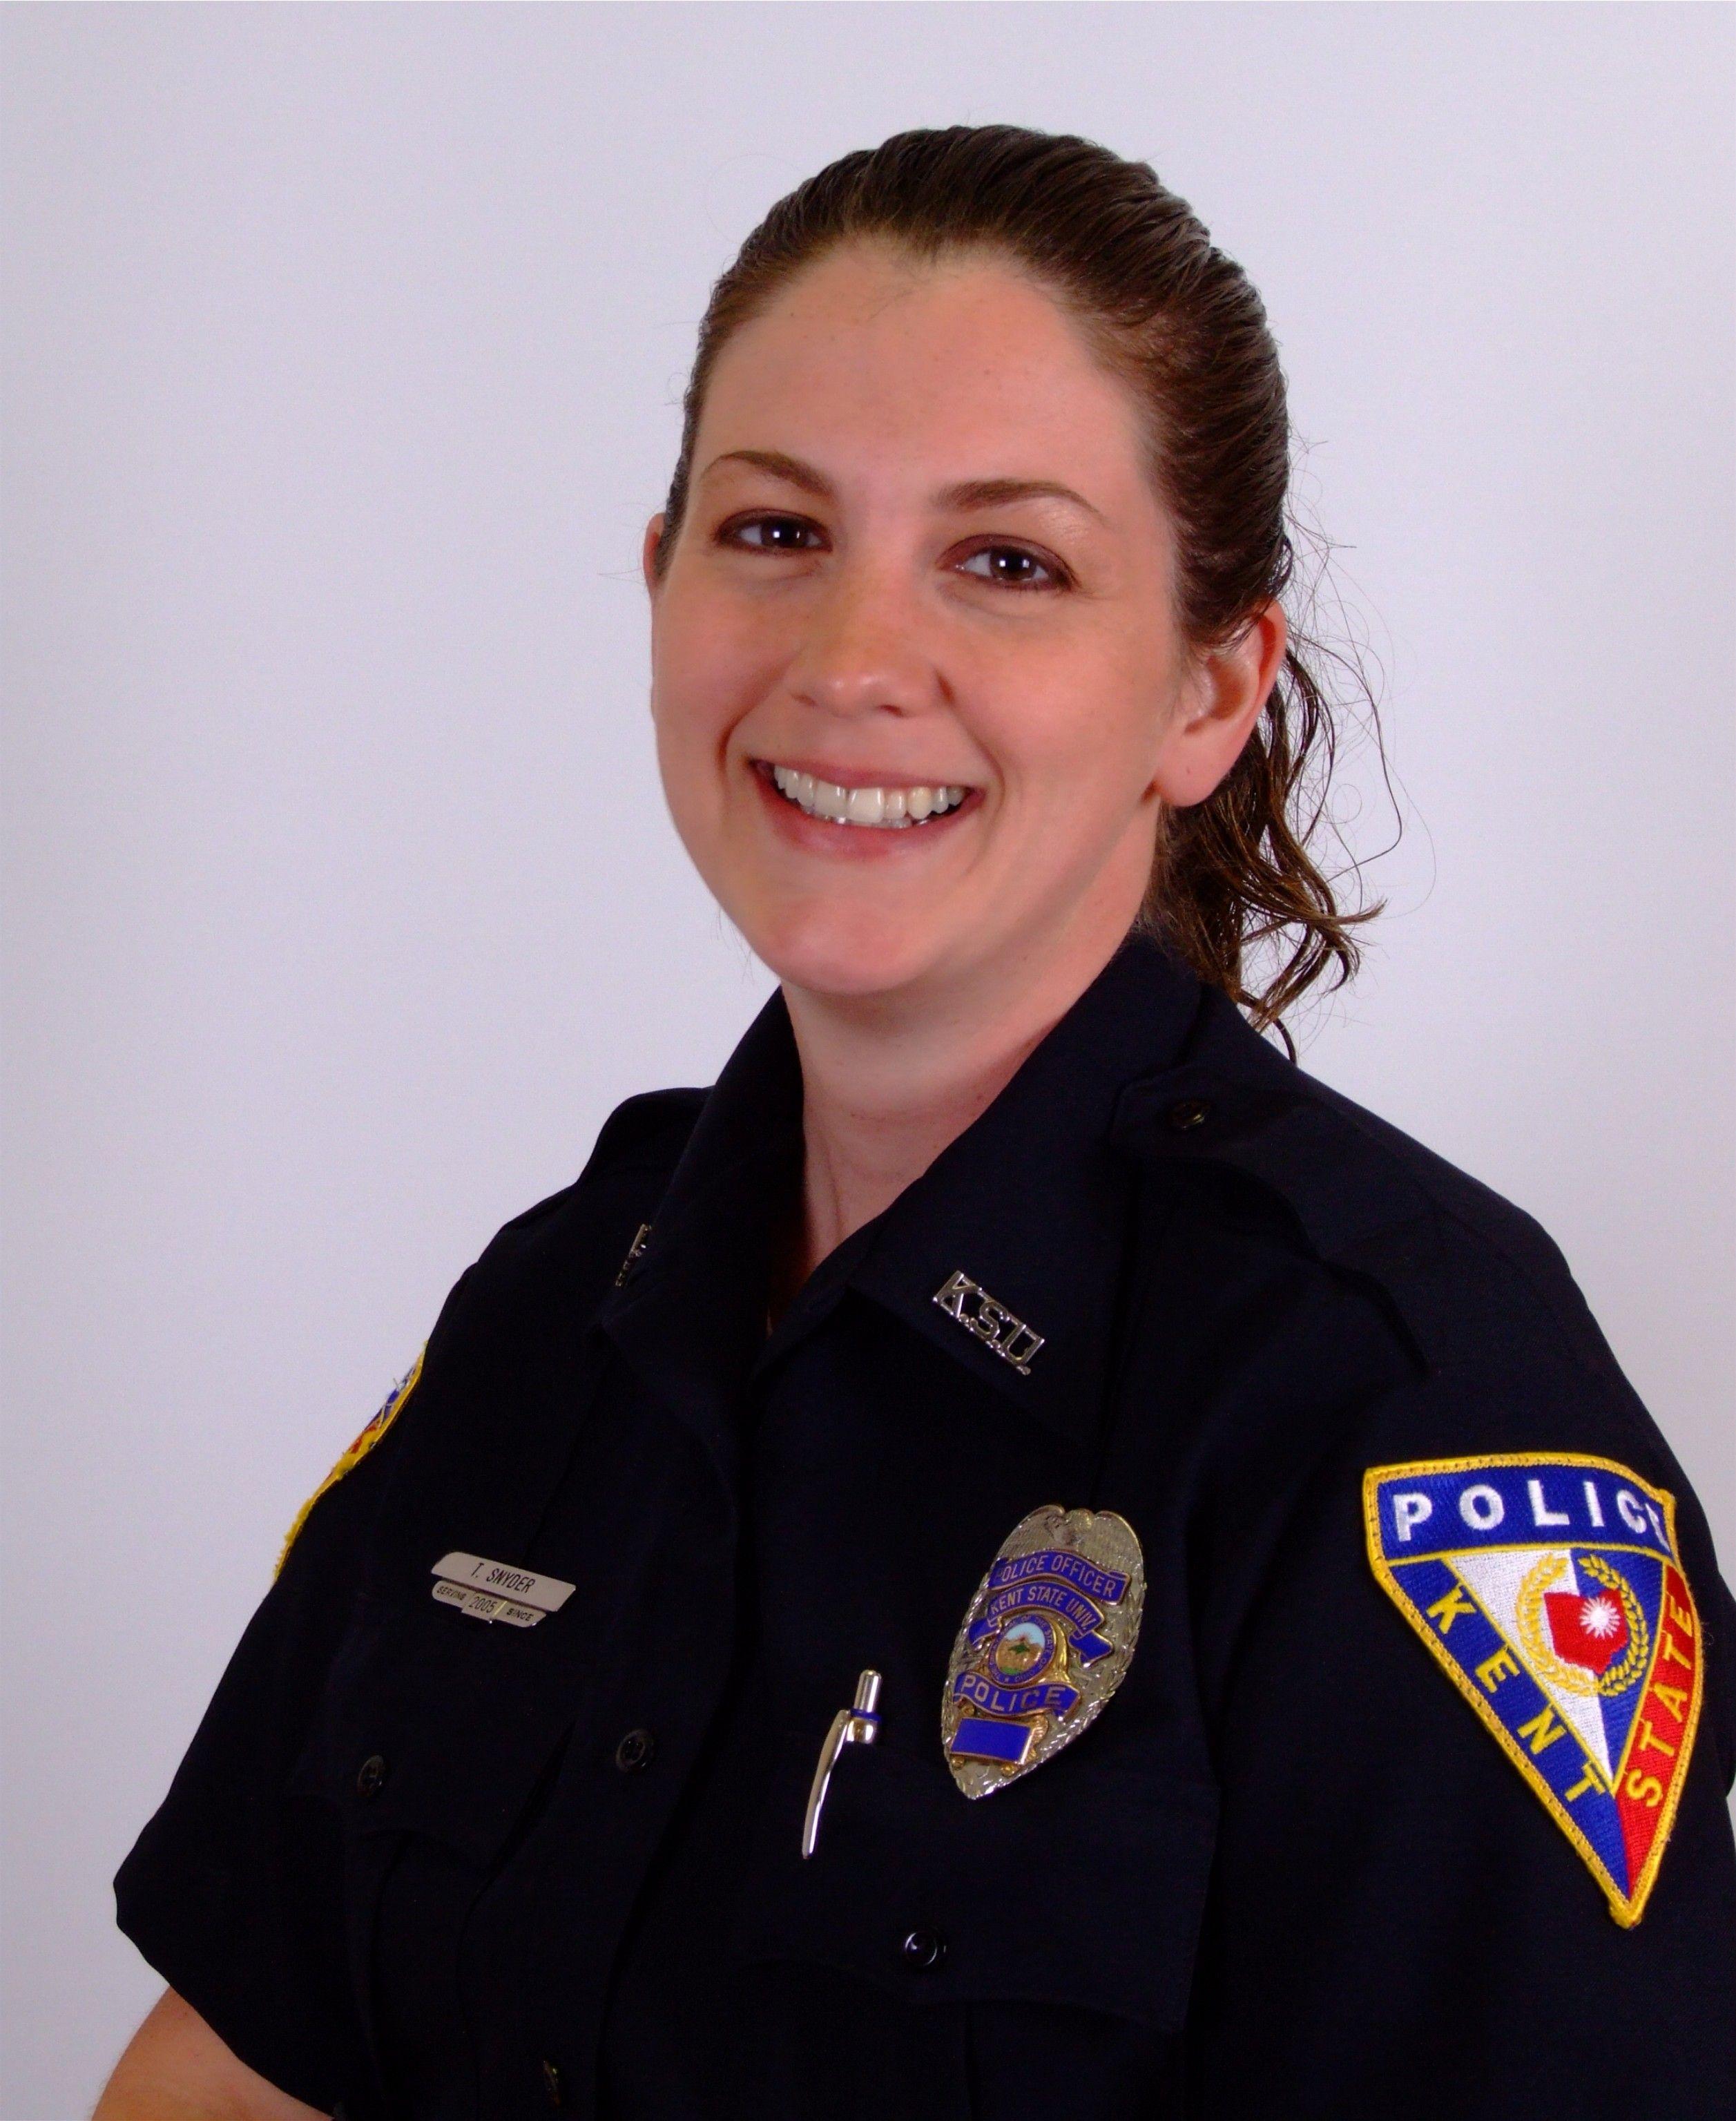 Headshot of Tricia Knoles